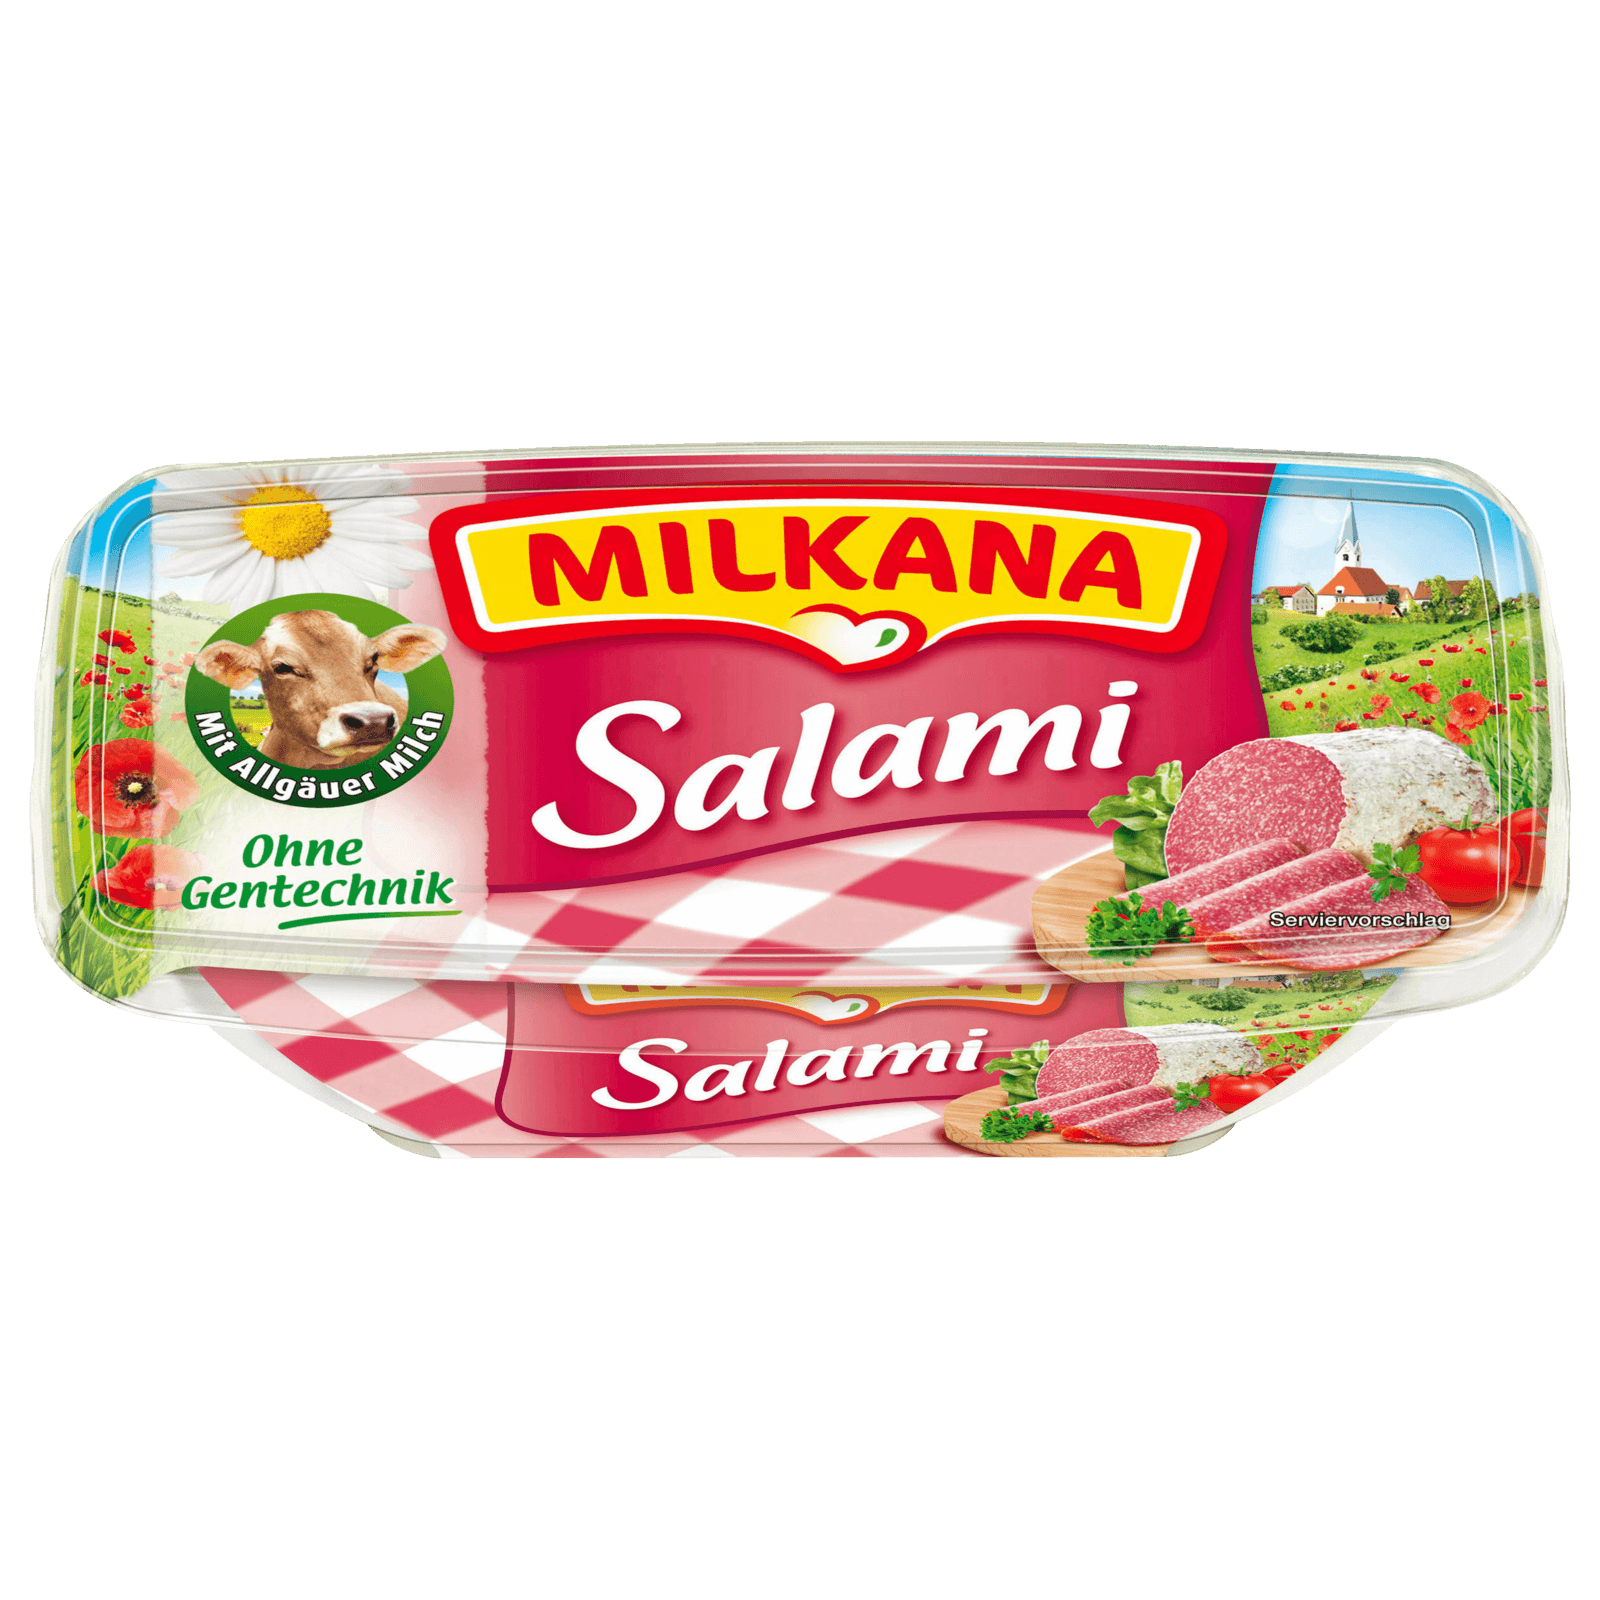 Milkana Salami 200g